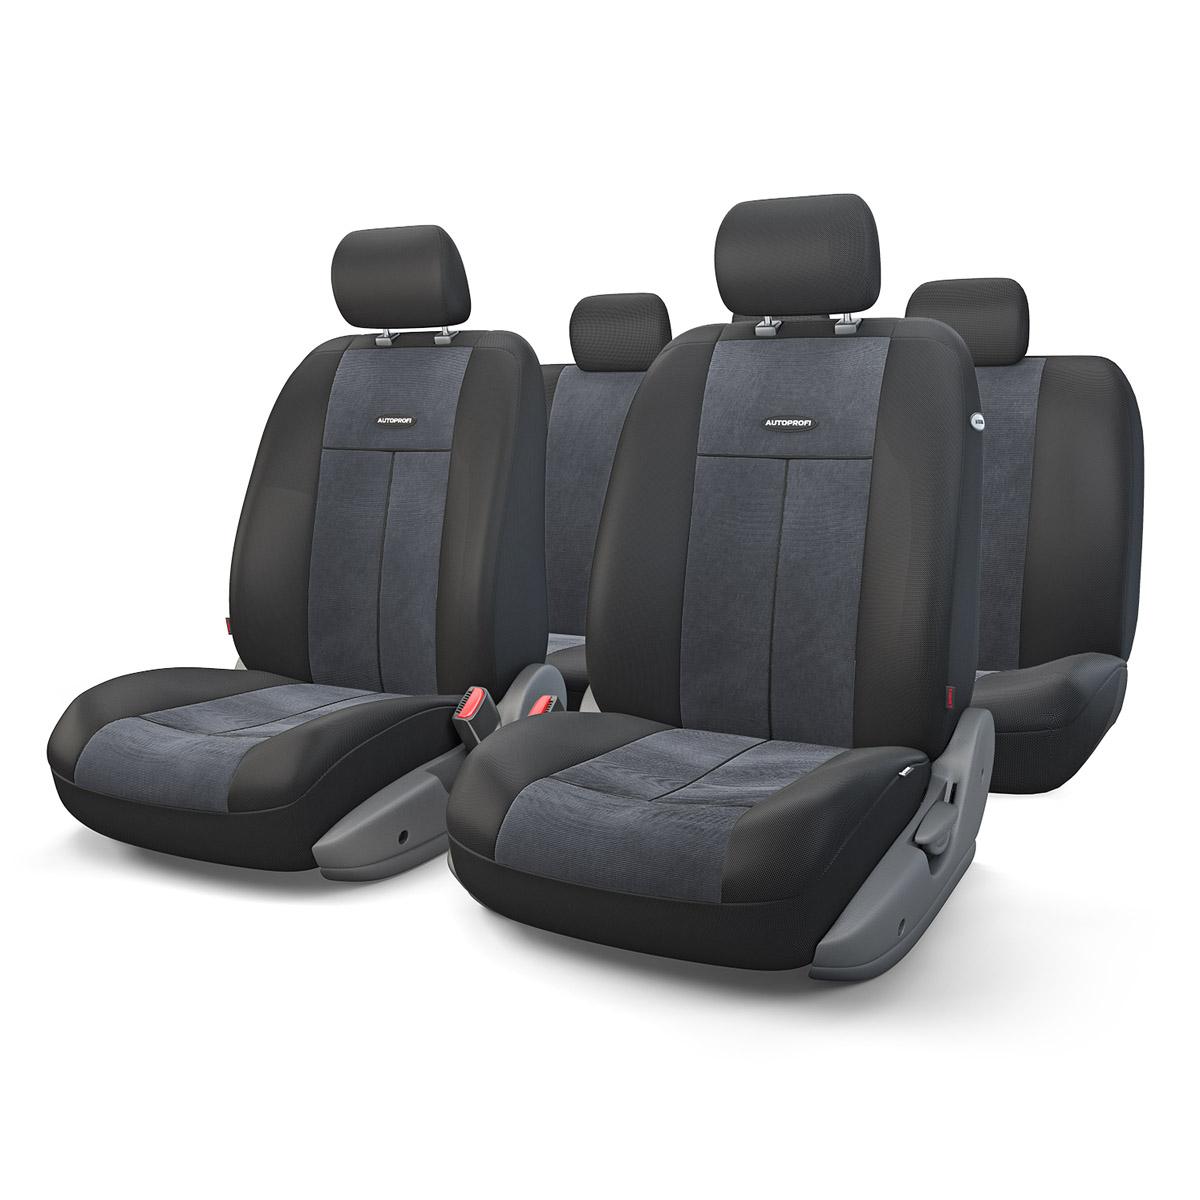 Чехол на сиденье Autoprofi Tt-902v bk/bk чехлы на сиденья autoprofi автомобильные чехлы tt tt 902m bk bl